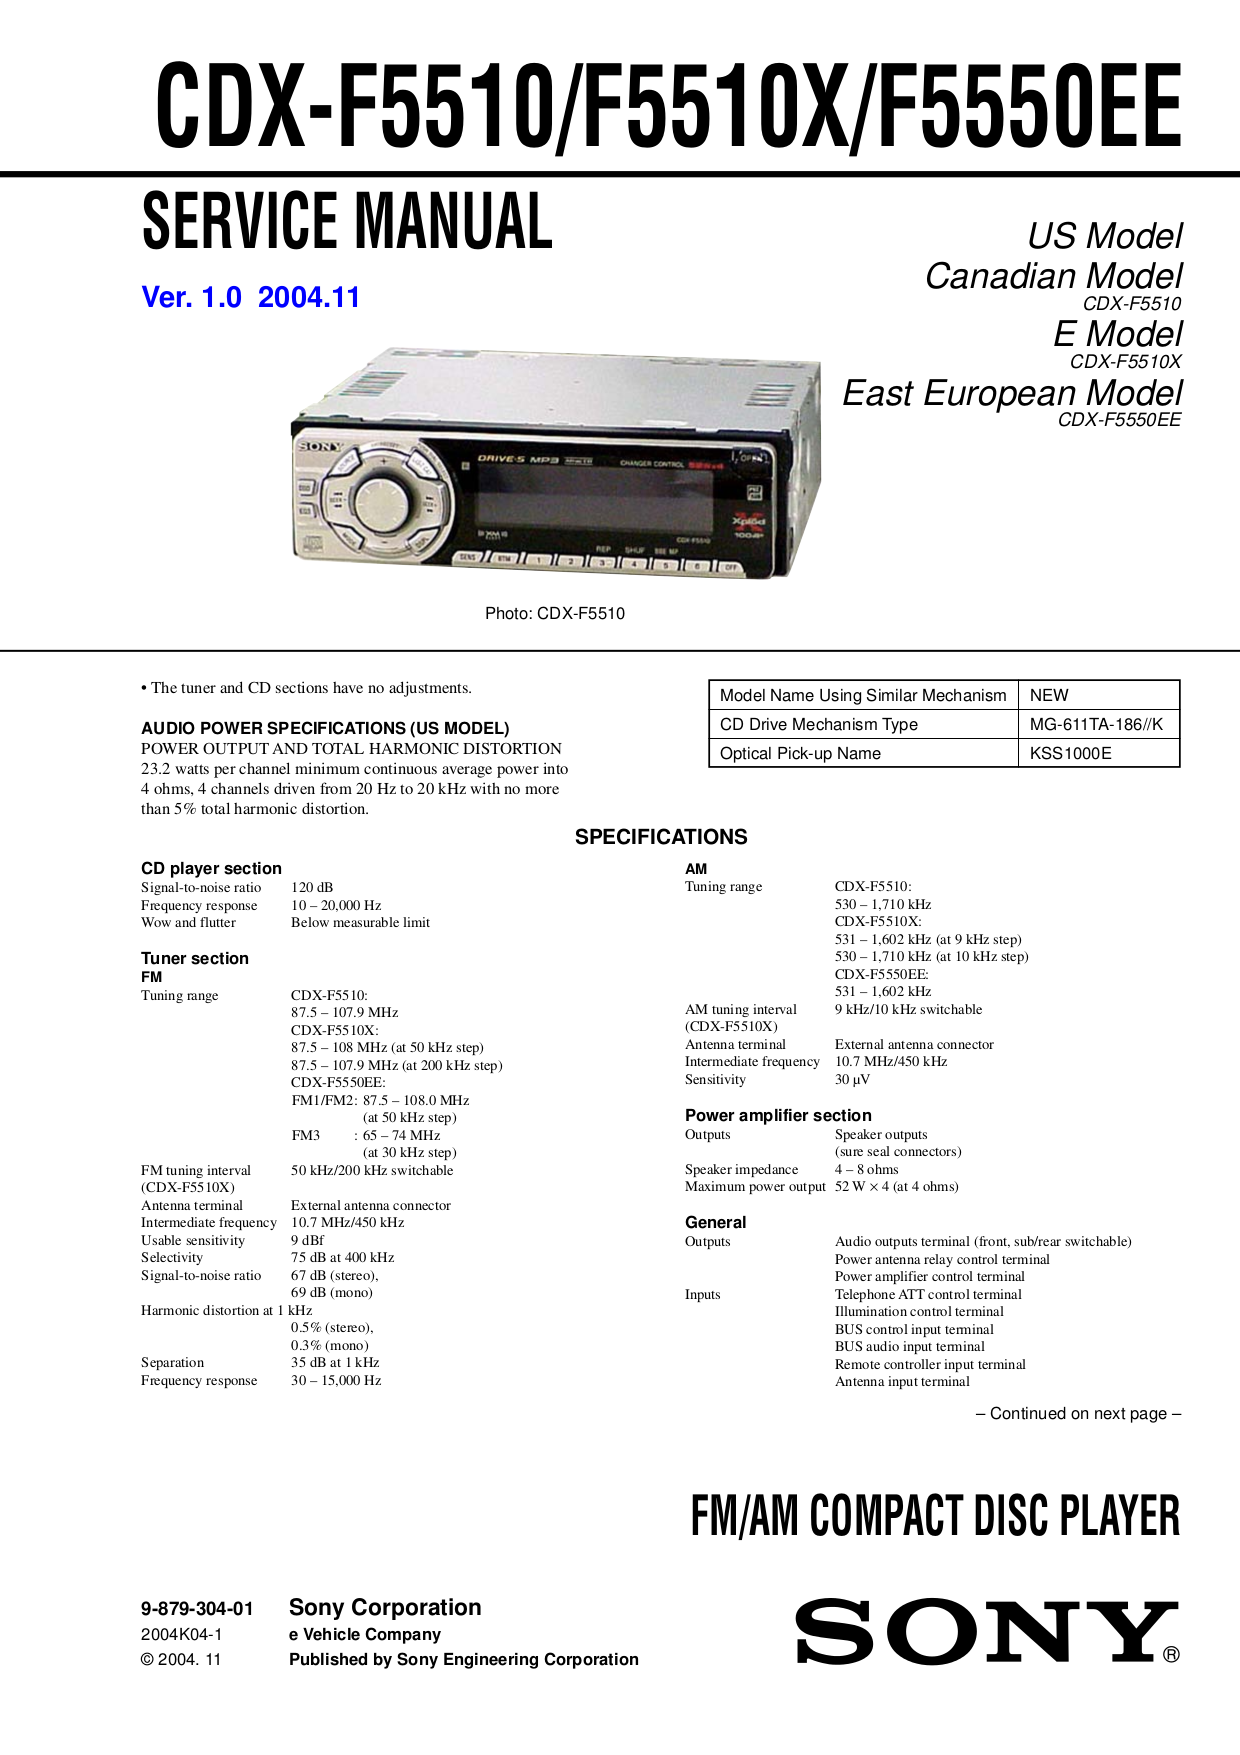 Sony Cdx F5710 Radio Wiring Diagram Wiring Diagrams Source